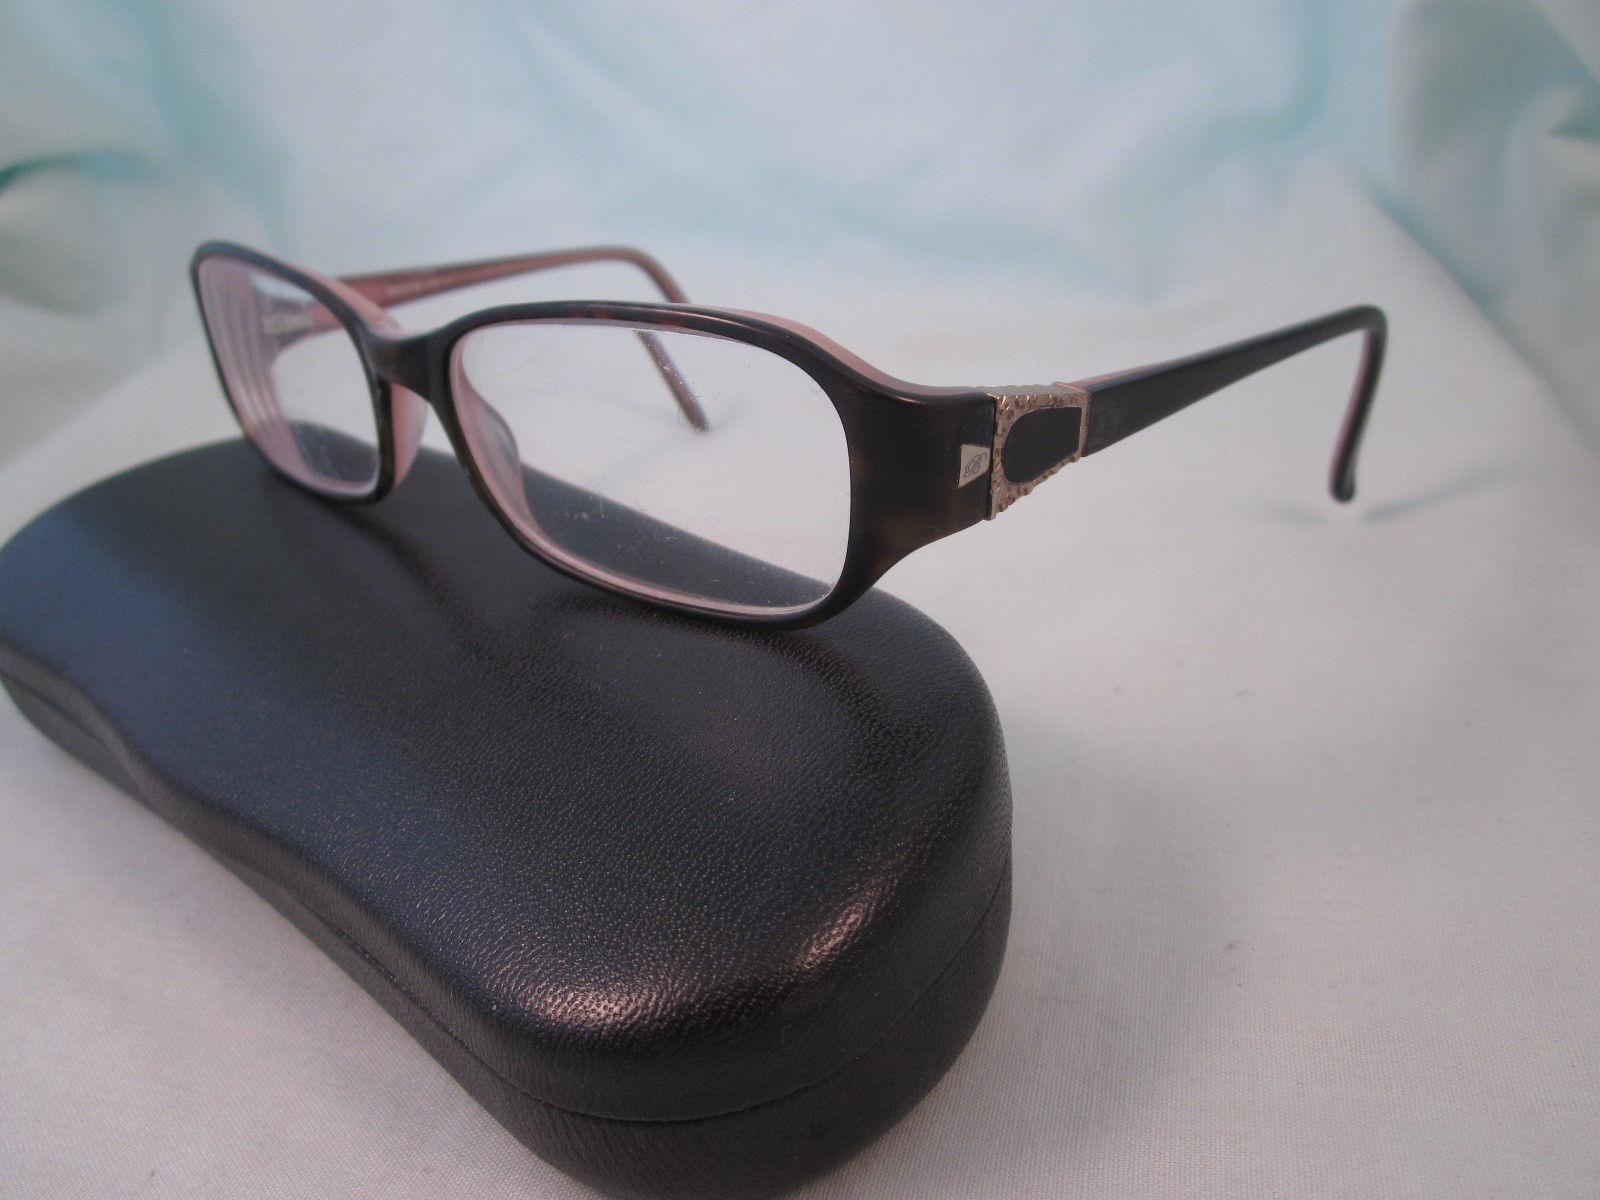 25018f81577 BULOVA Rx Eyeglasses ASHLAND Plastic Full Rim Rectangle Frames ROSE Brown  Gold